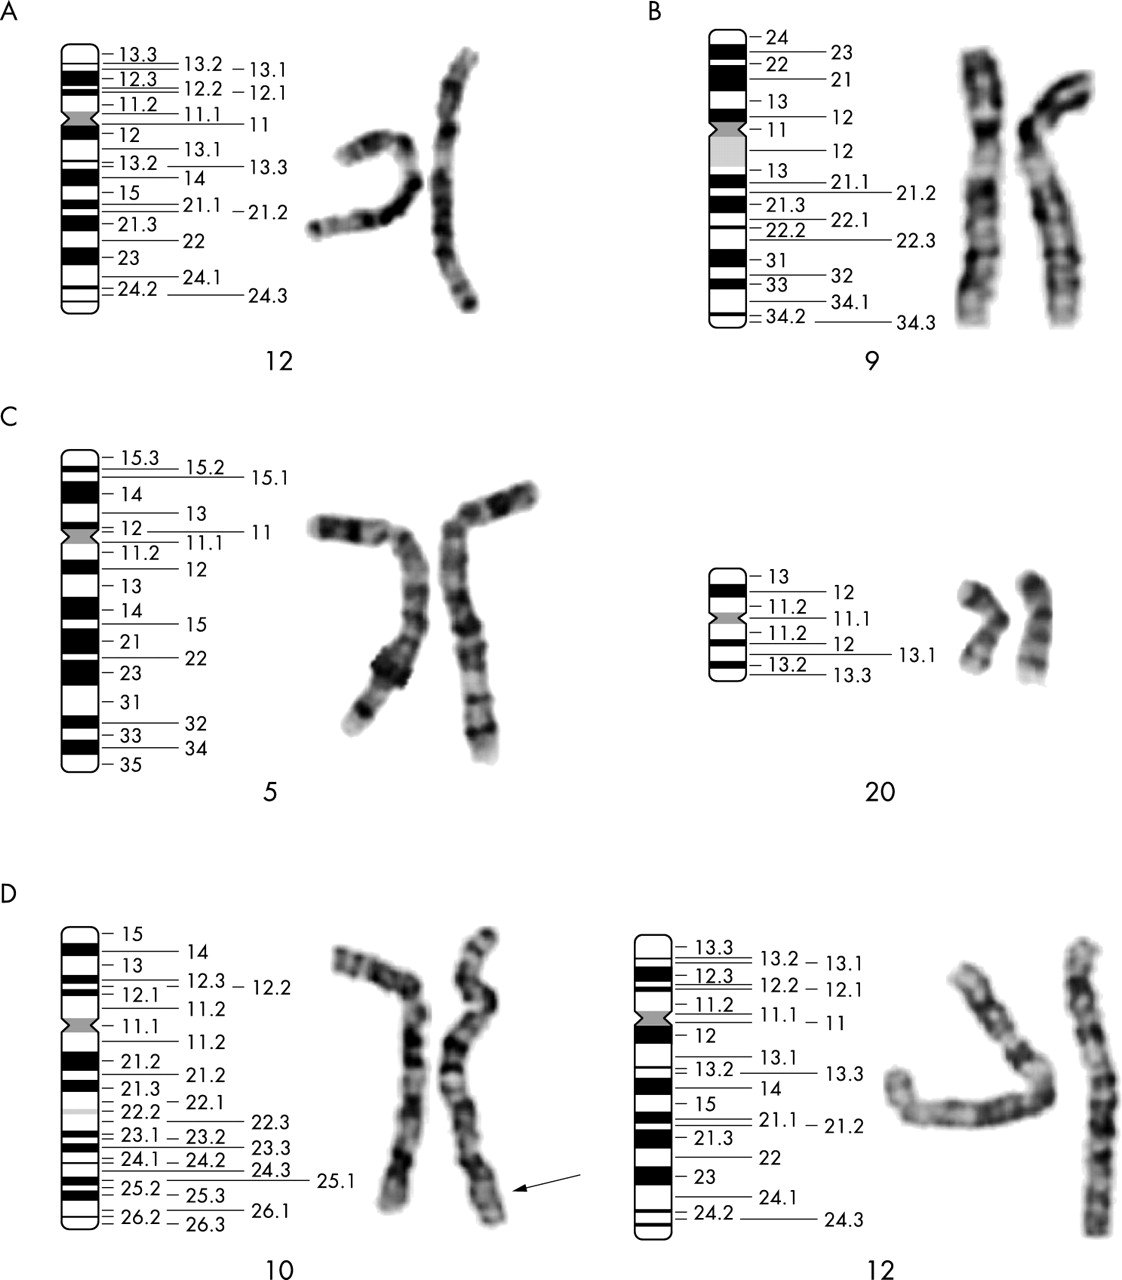 Subtelomere specific microarray based comparative genomic